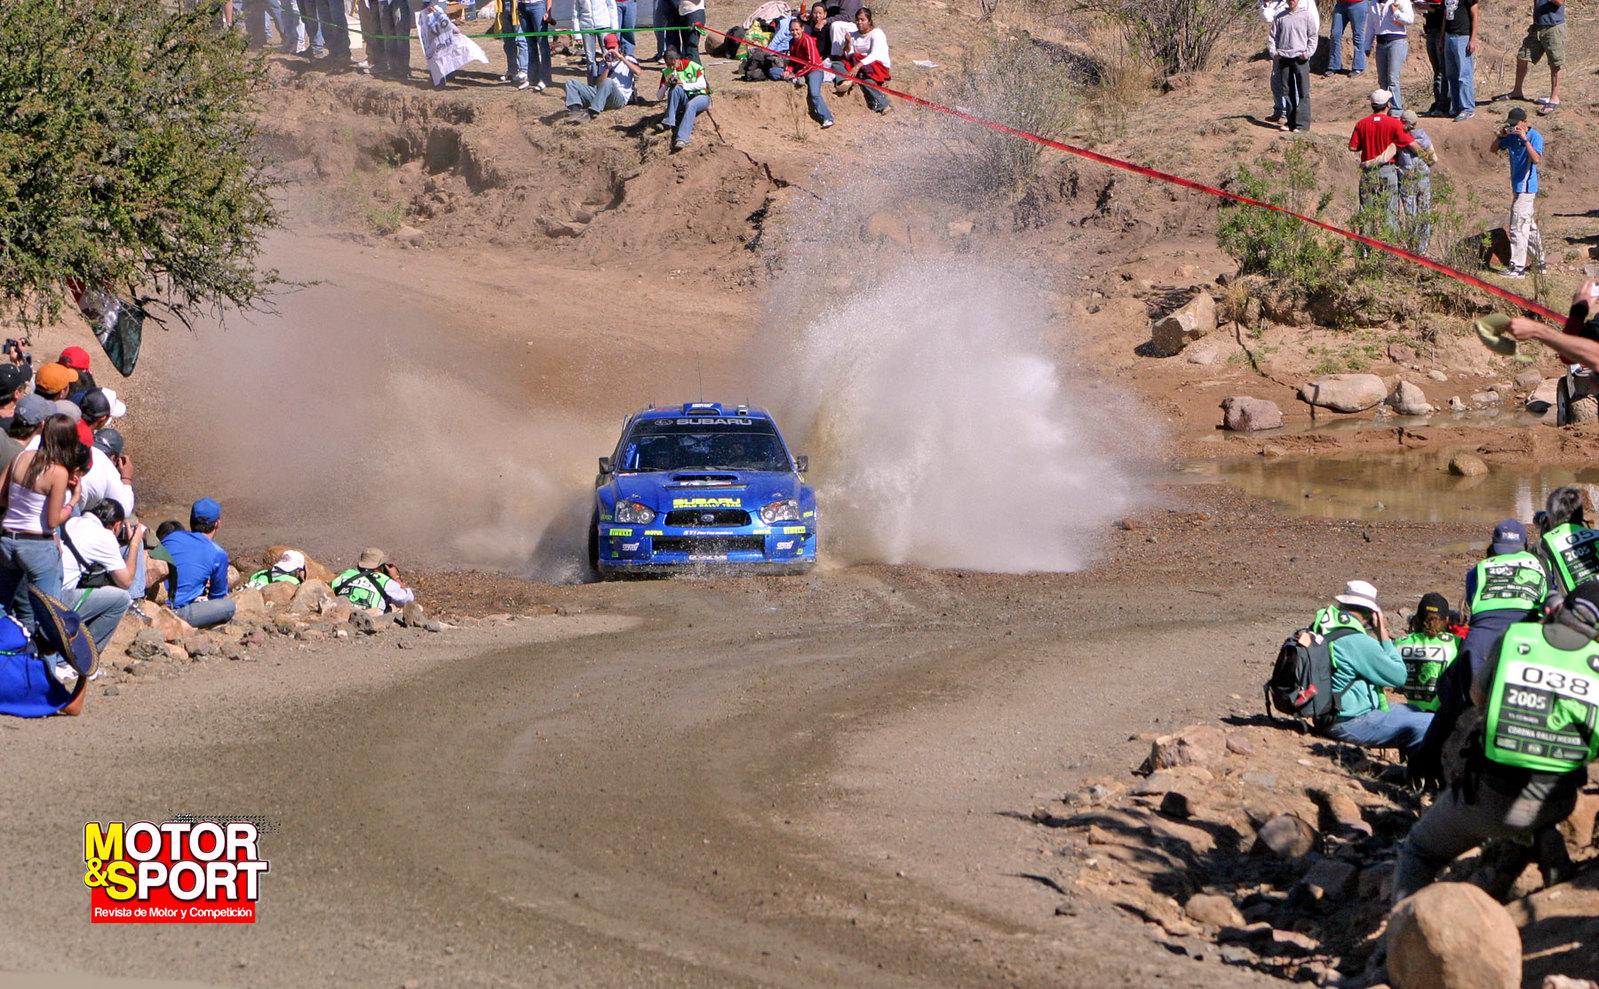 Rally Mexico 2005 15991881640_e3f89a8475_h